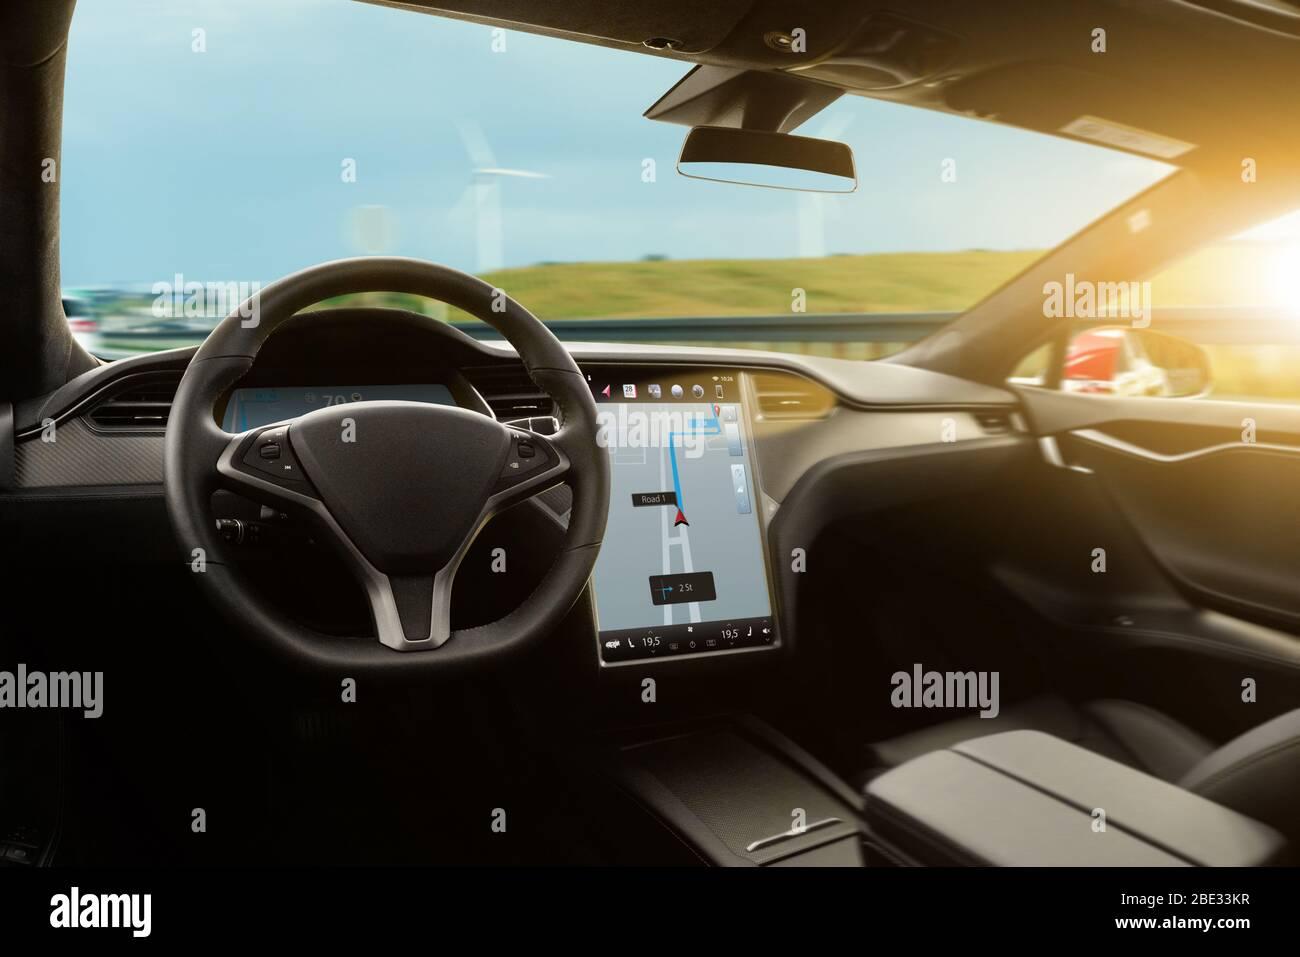 Autonomous Car With Hud Head Up Display Self Driving Vehicle Stock Photo Alamy